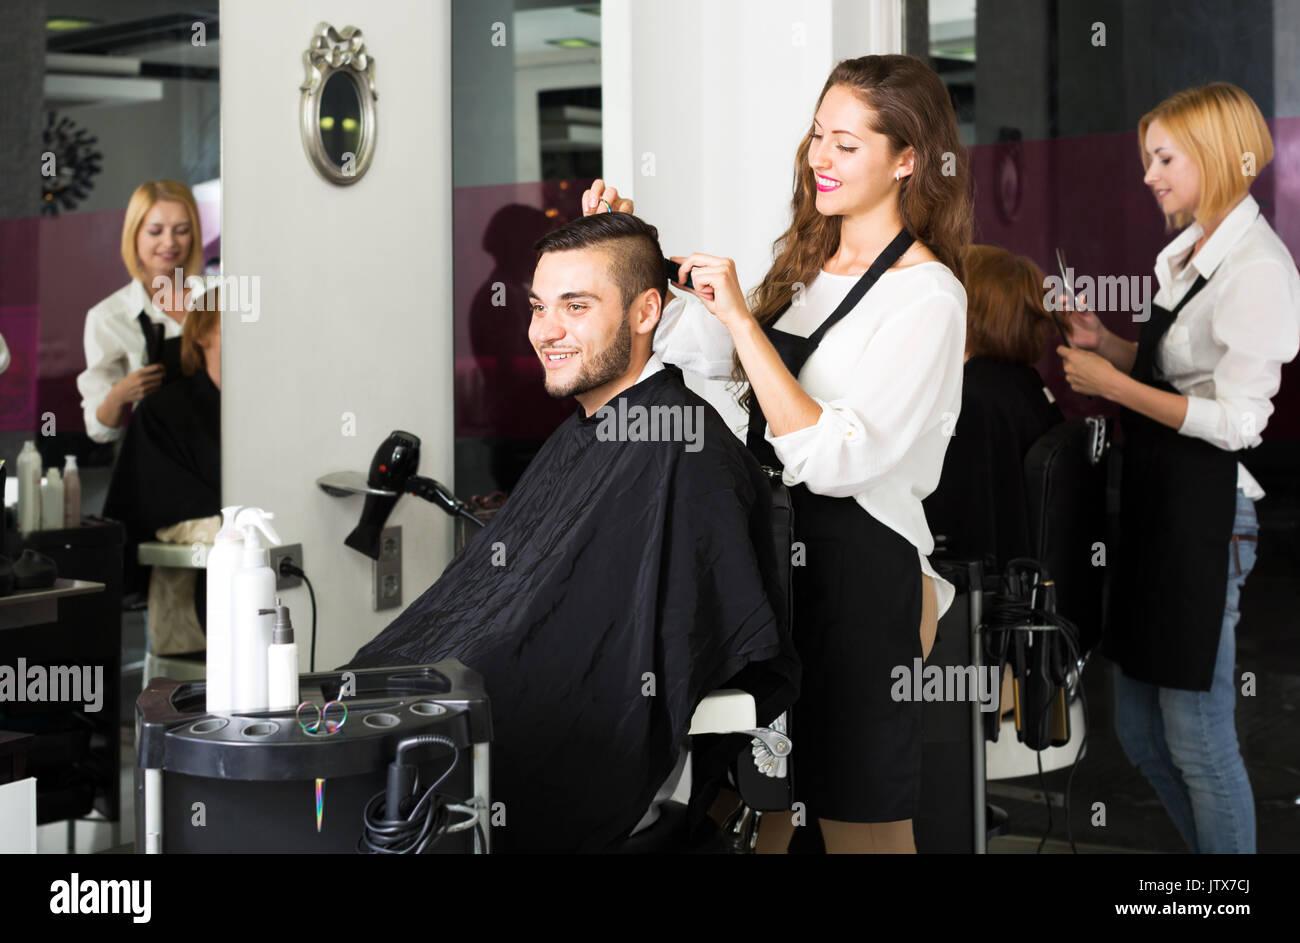 Happy guy cuts hair at the hair salon Stock Photo - Alamy